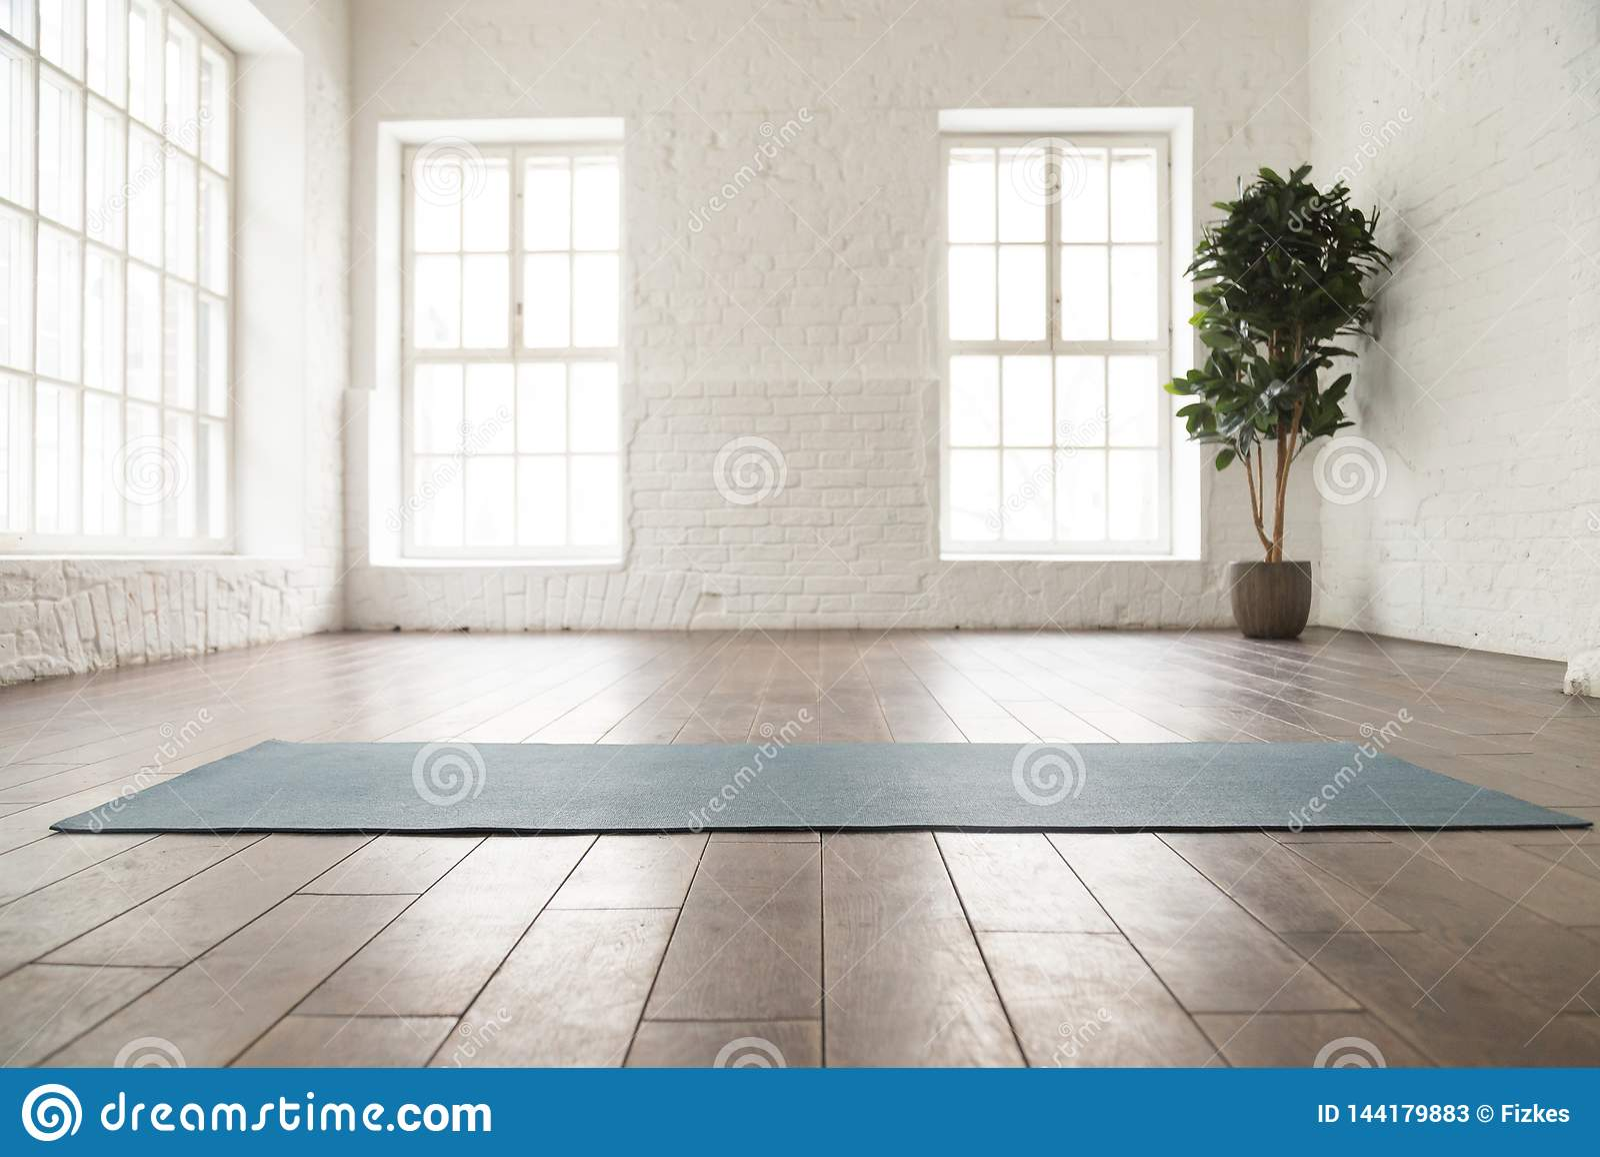 Unrolled Yoga Mat On Wooden Floor In Yoga Studio Stock Image Image Of Life Club 144179883